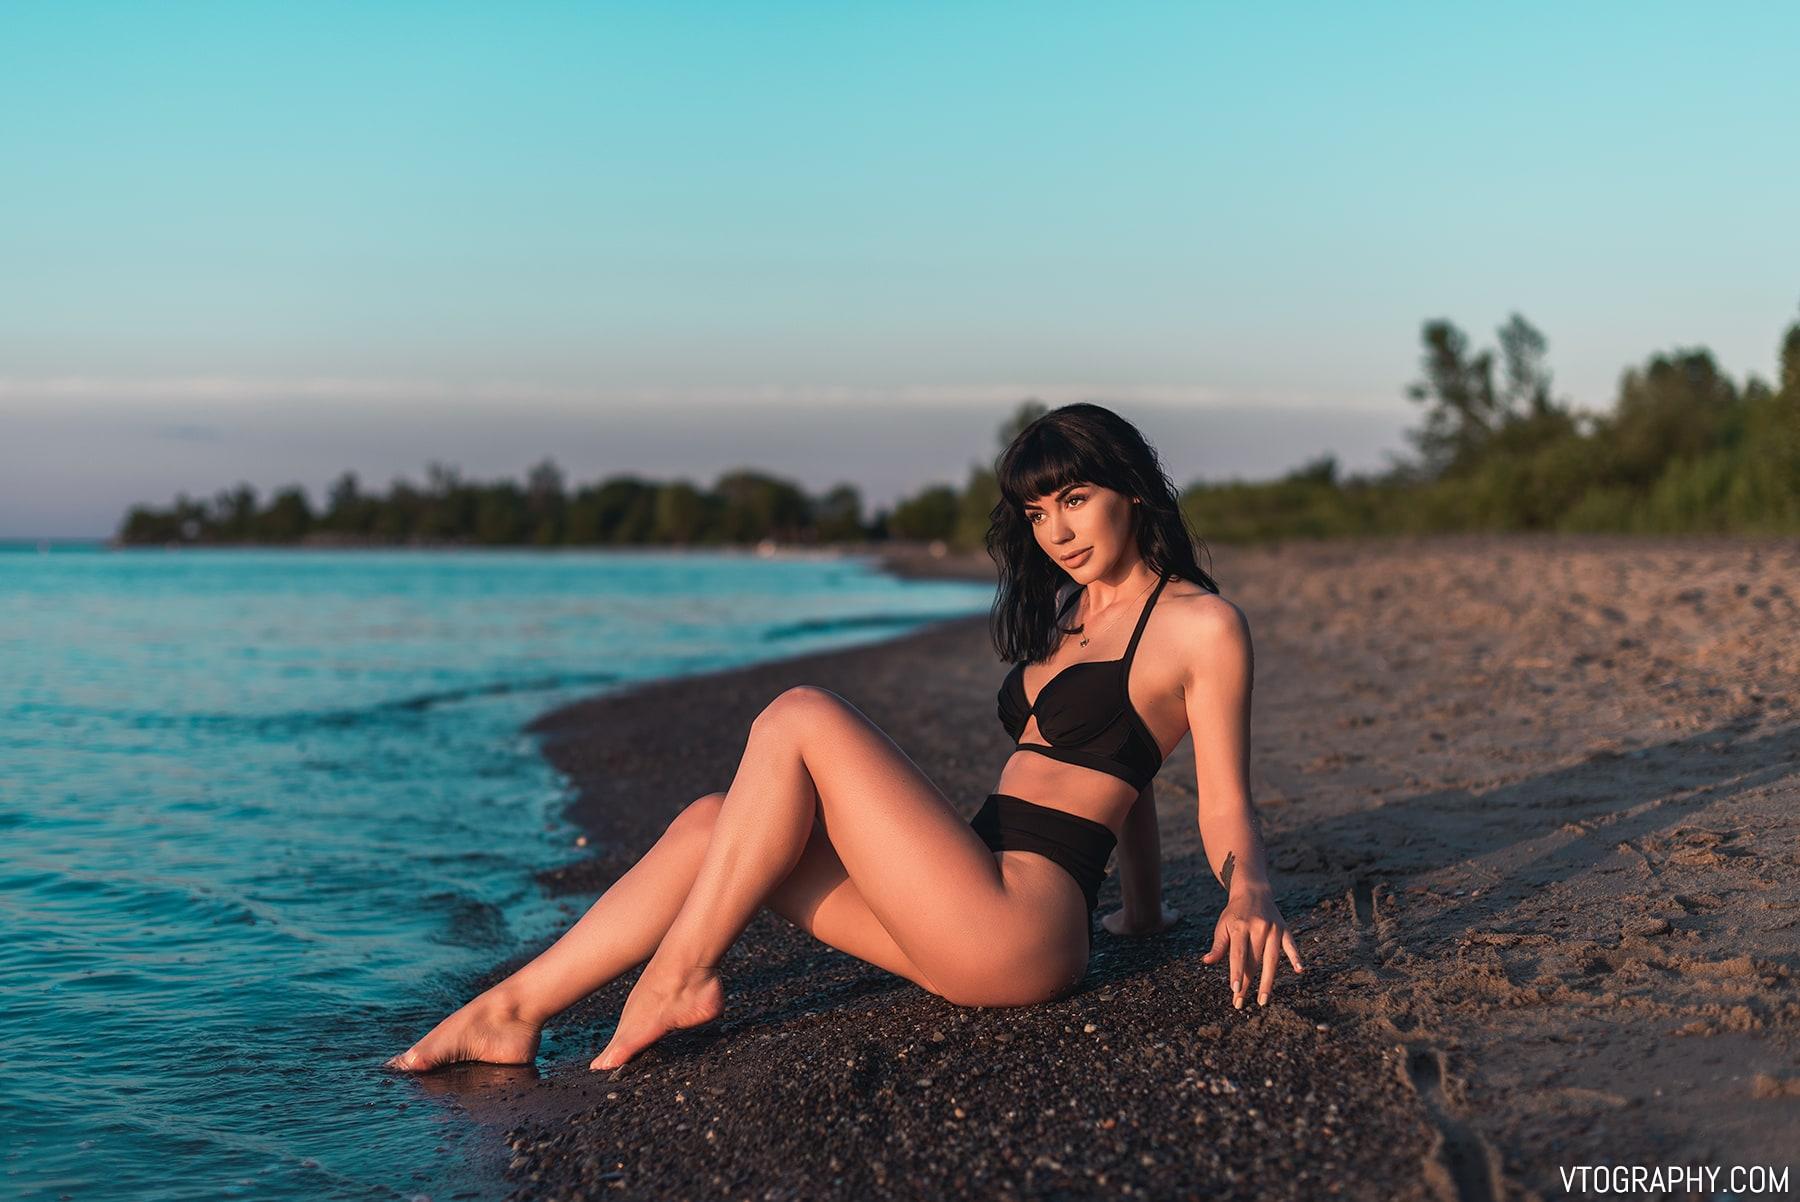 Black bikini on the beach